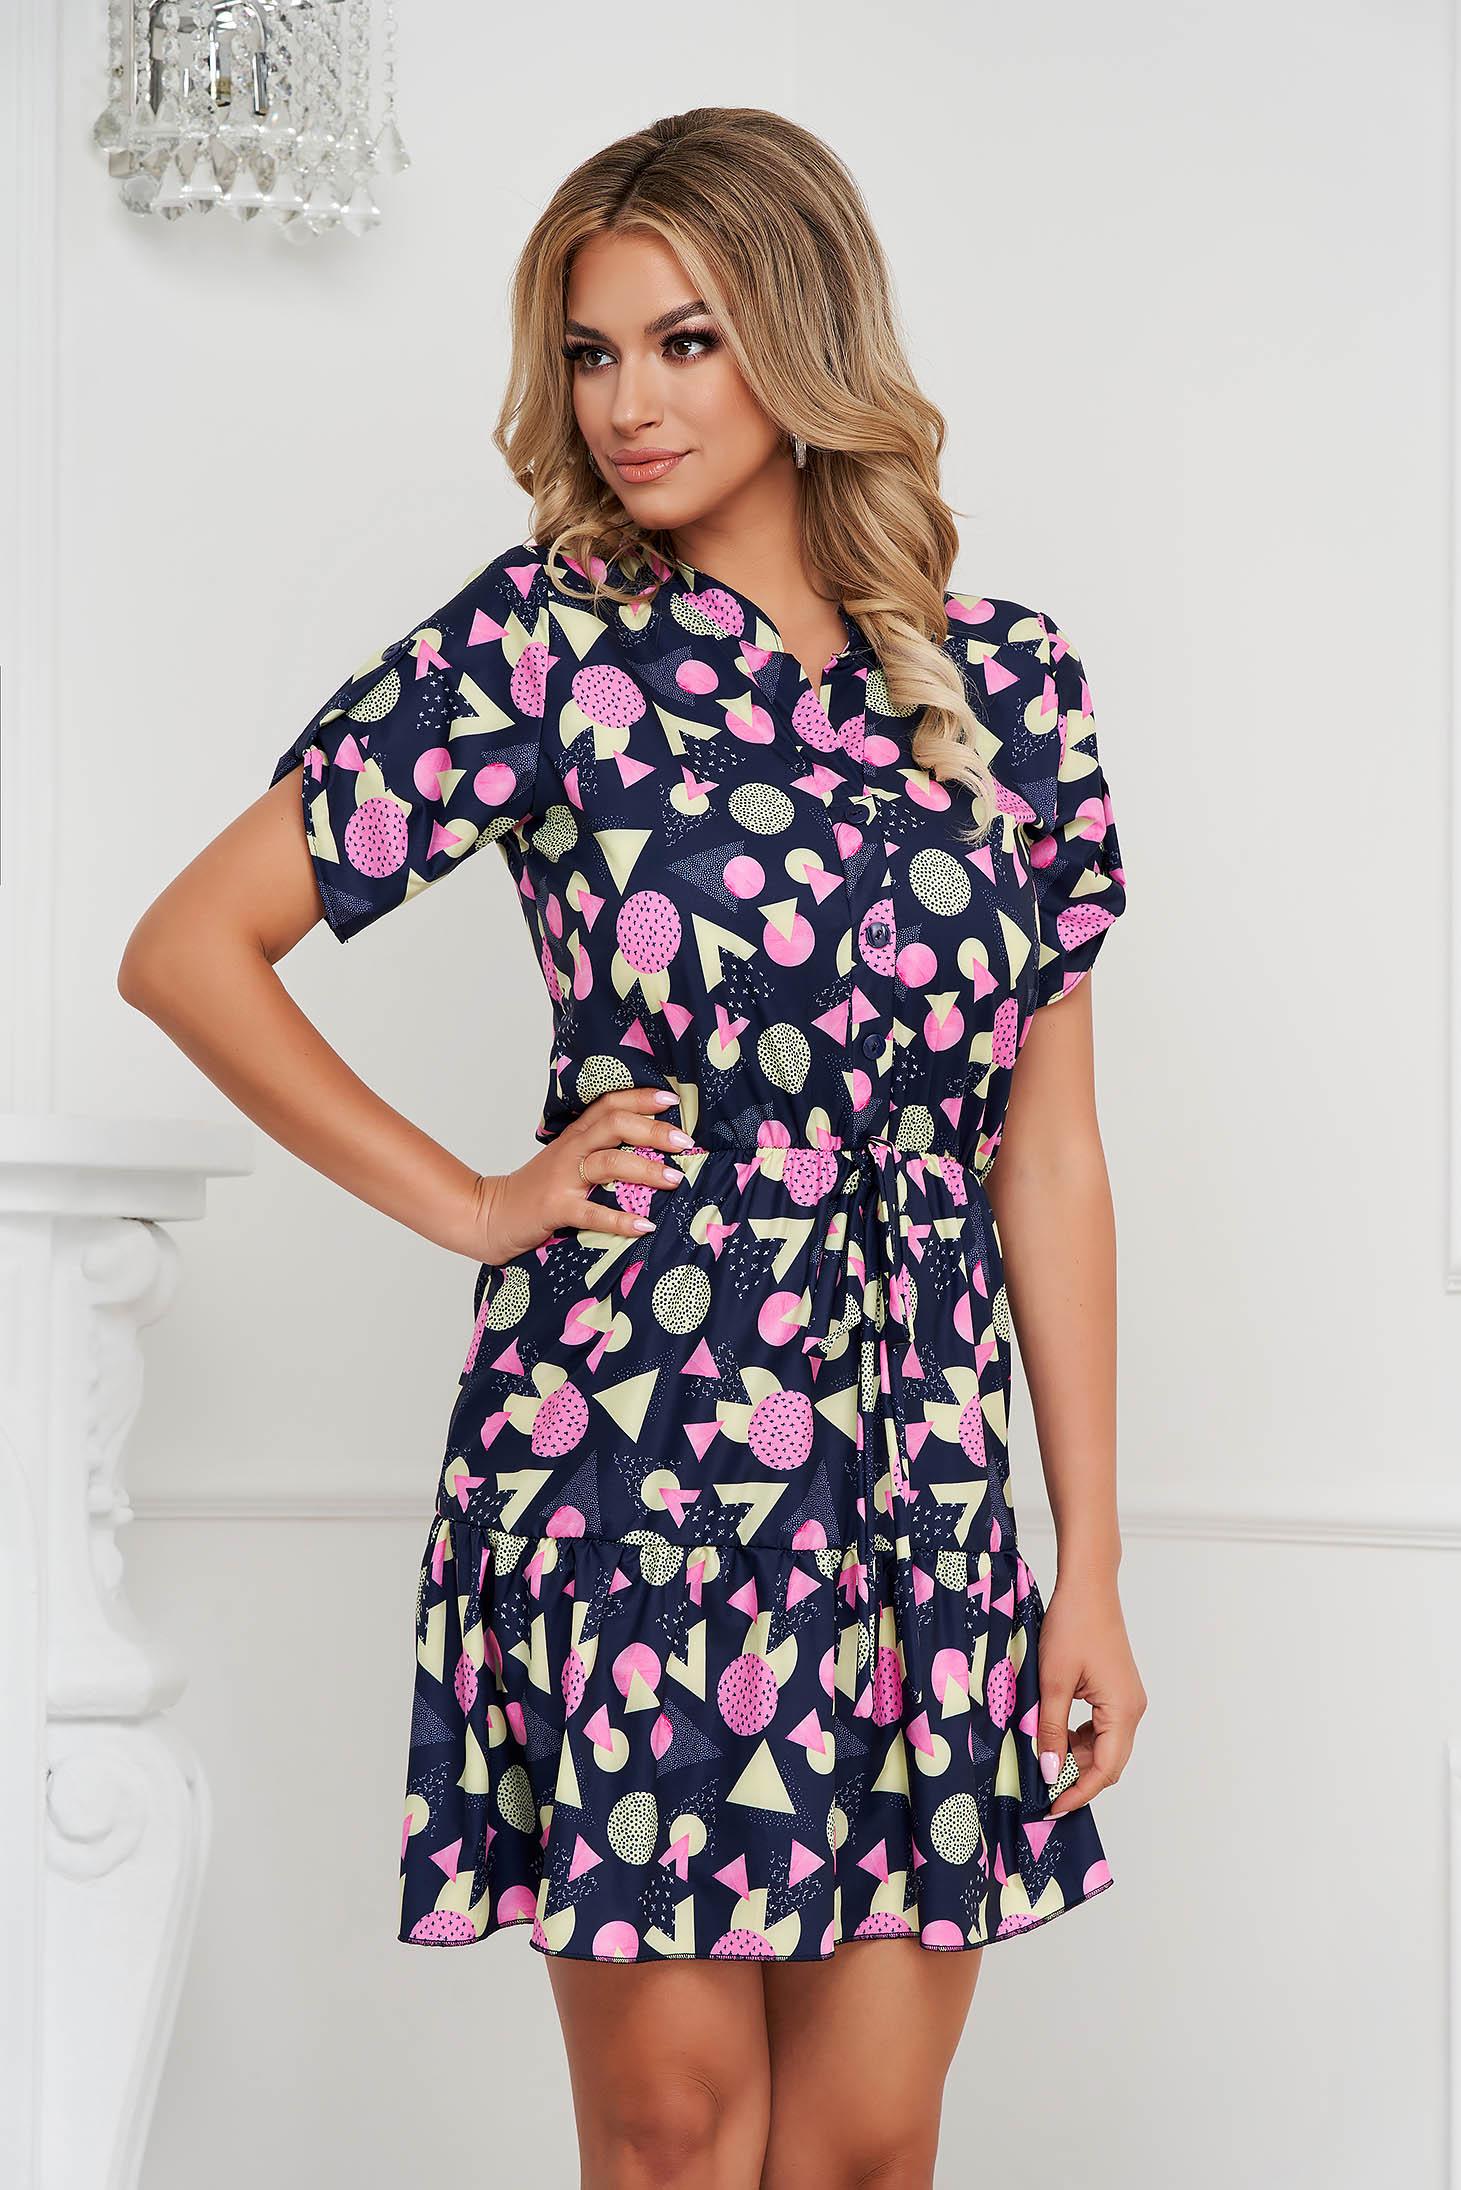 Dress short cut with elastic waist soft fabric